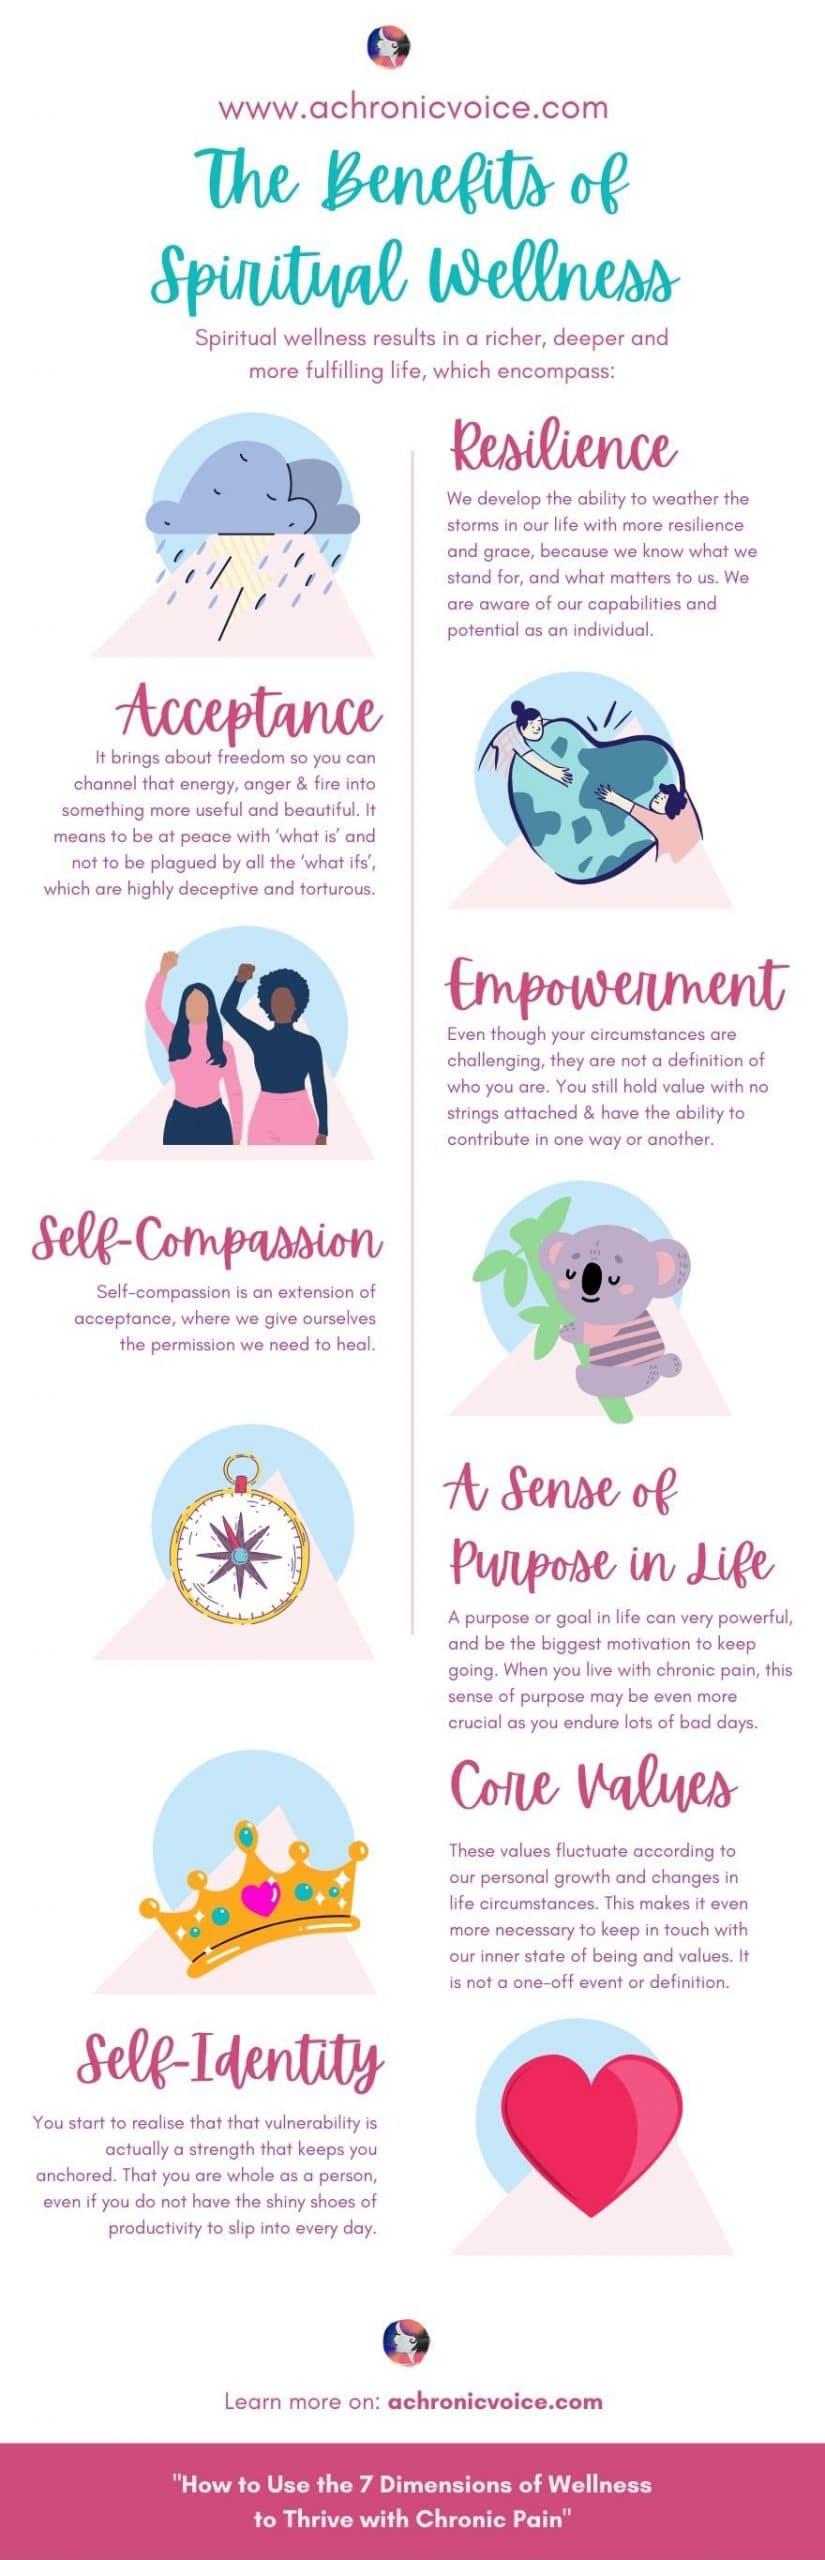 The Benefits of Spiritual Wellness Infographic